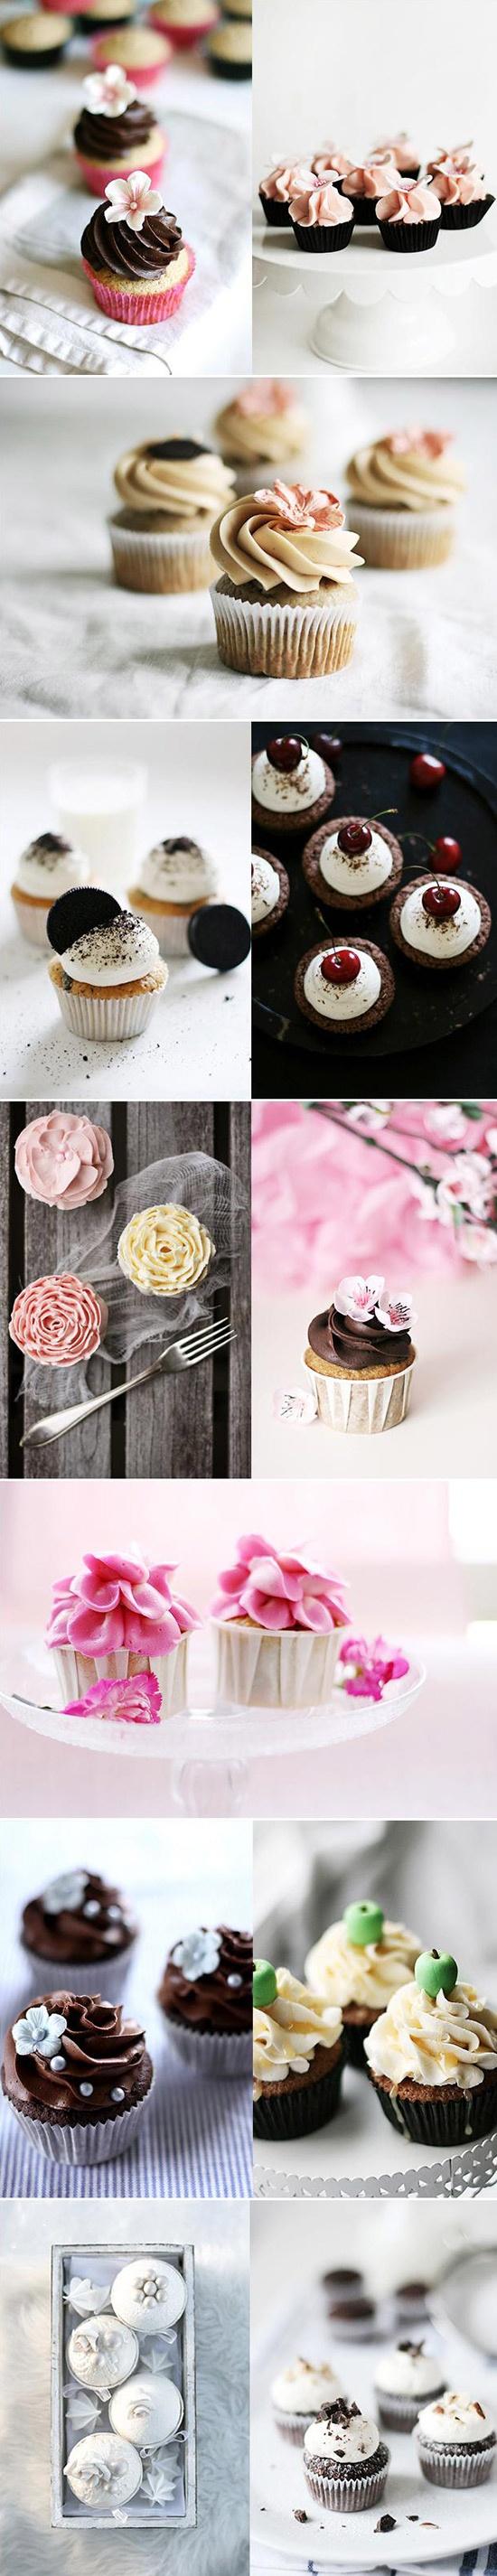 Cupckake Decorating Inspiration